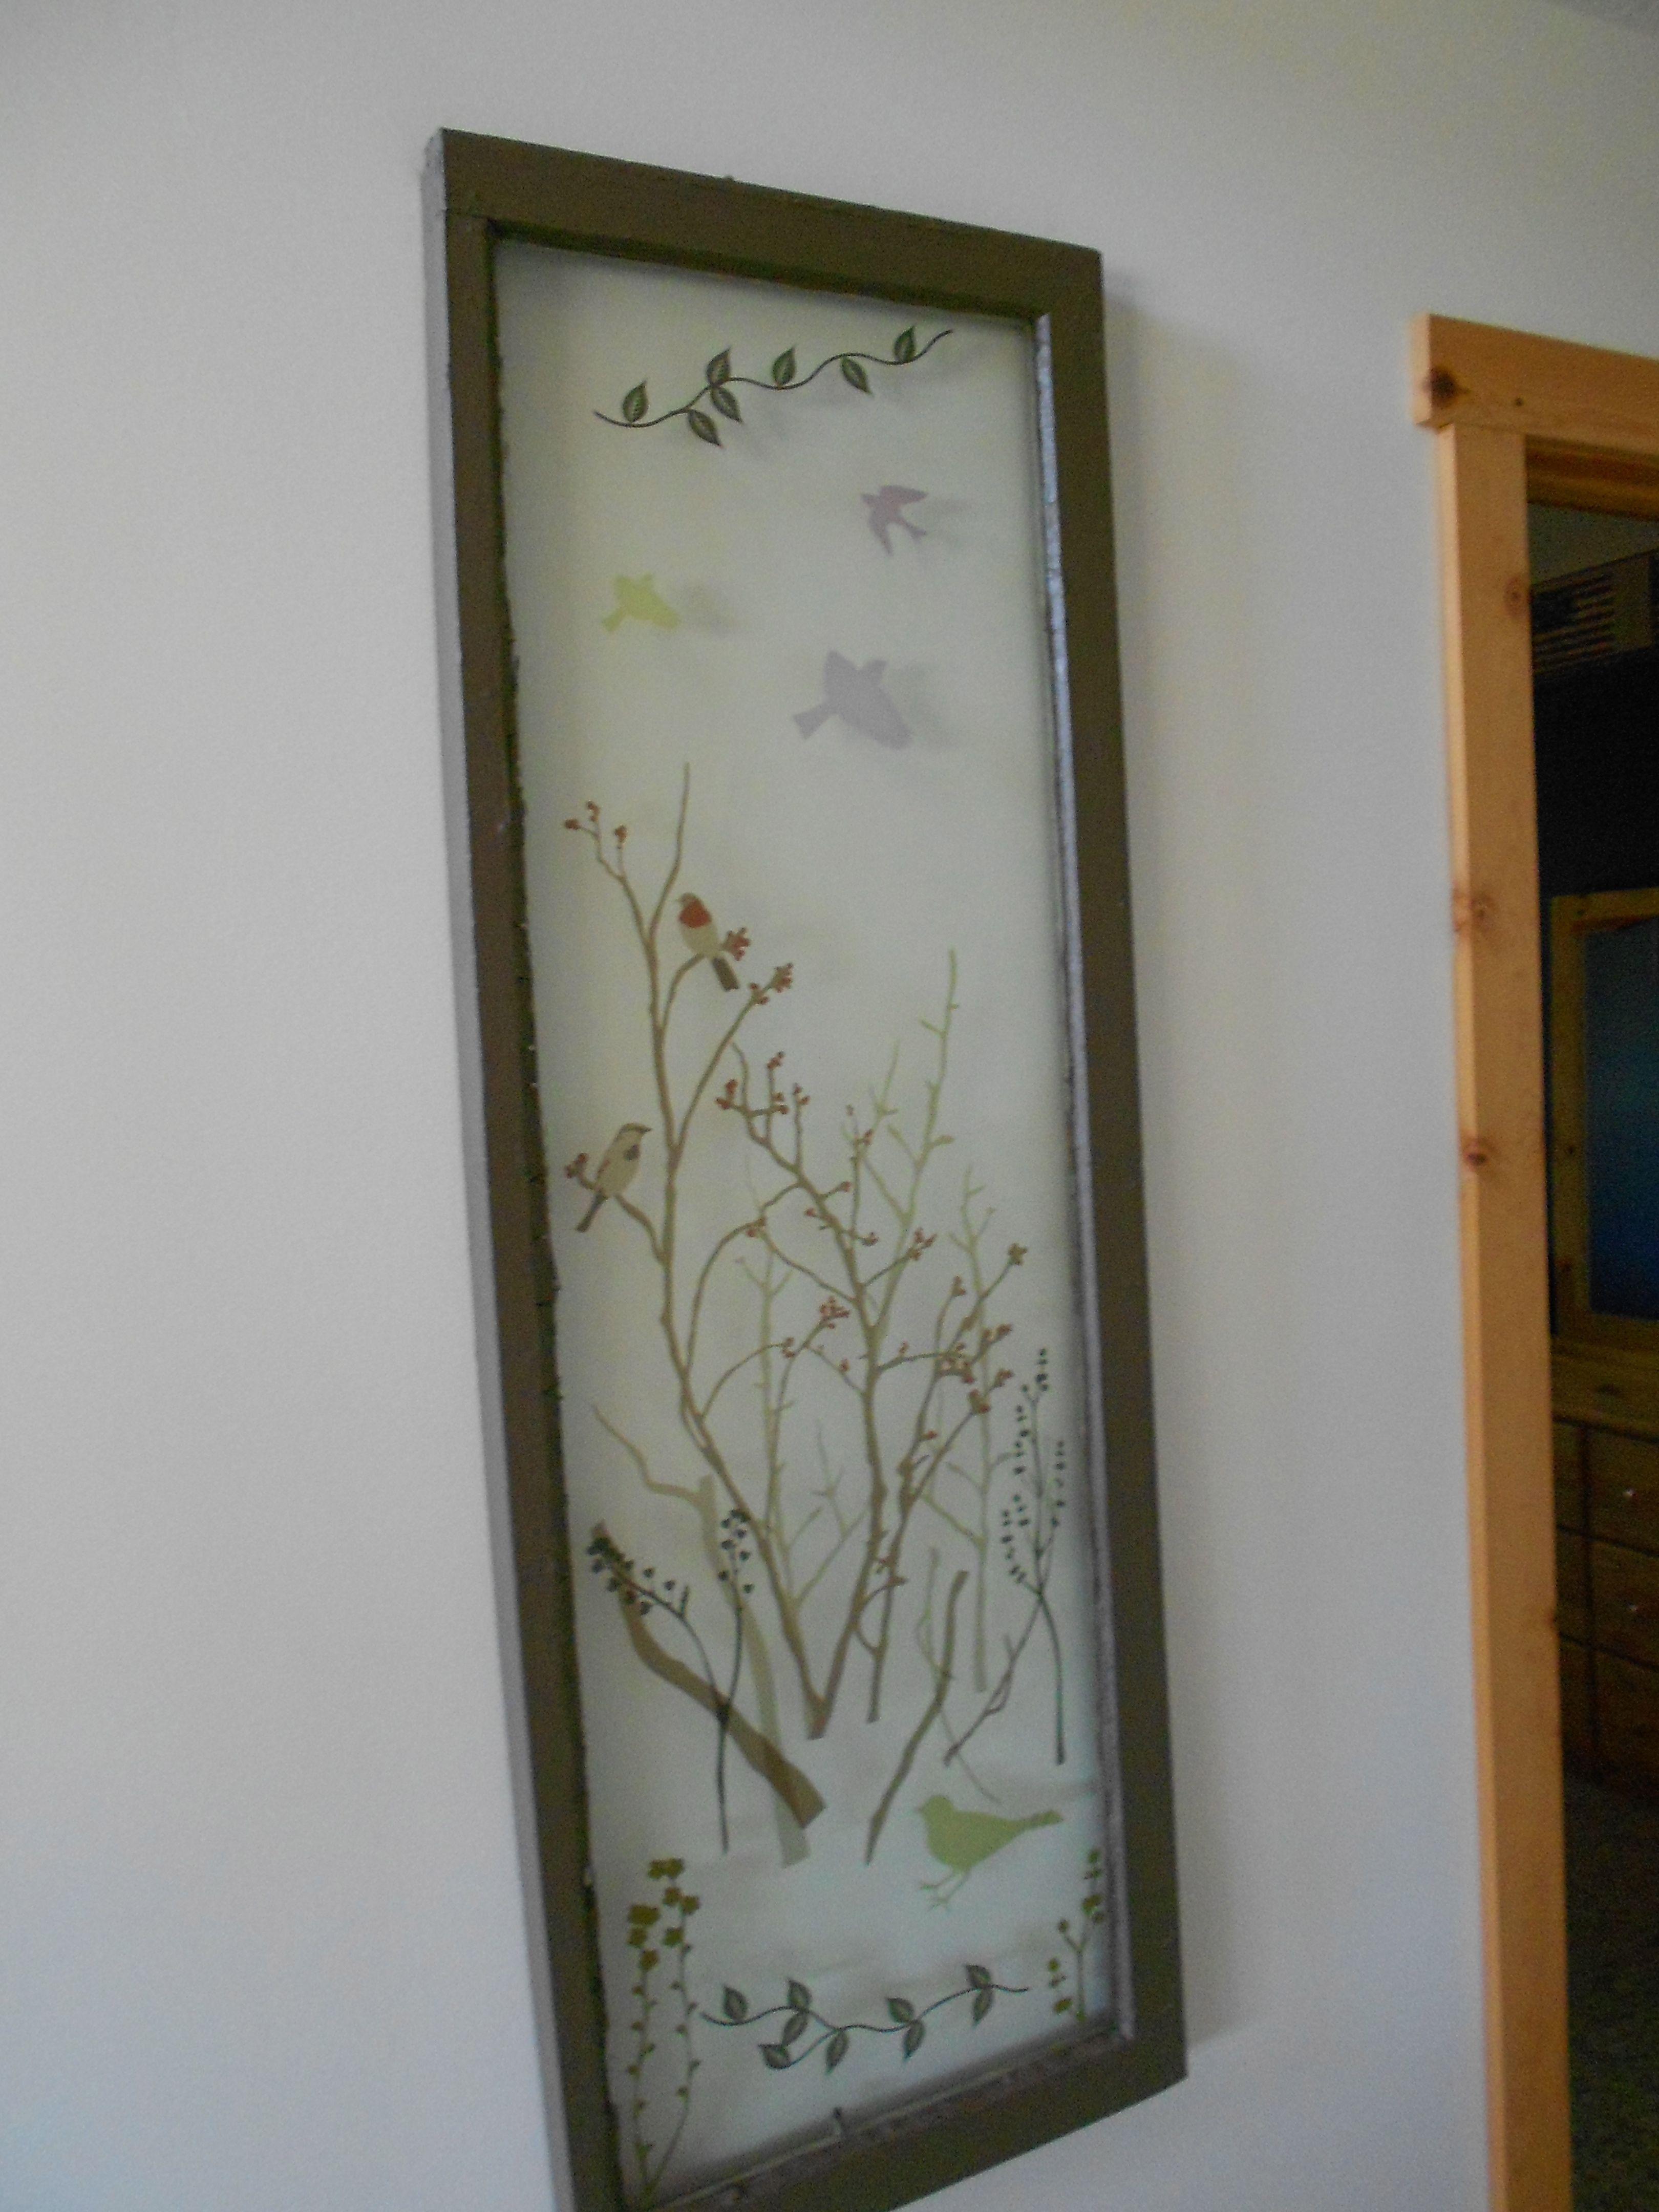 Old farm house window used wall stickers on the glass to create old farm house window used wall stickers on the glass to create inexpensive art work jeuxipadfo Gallery